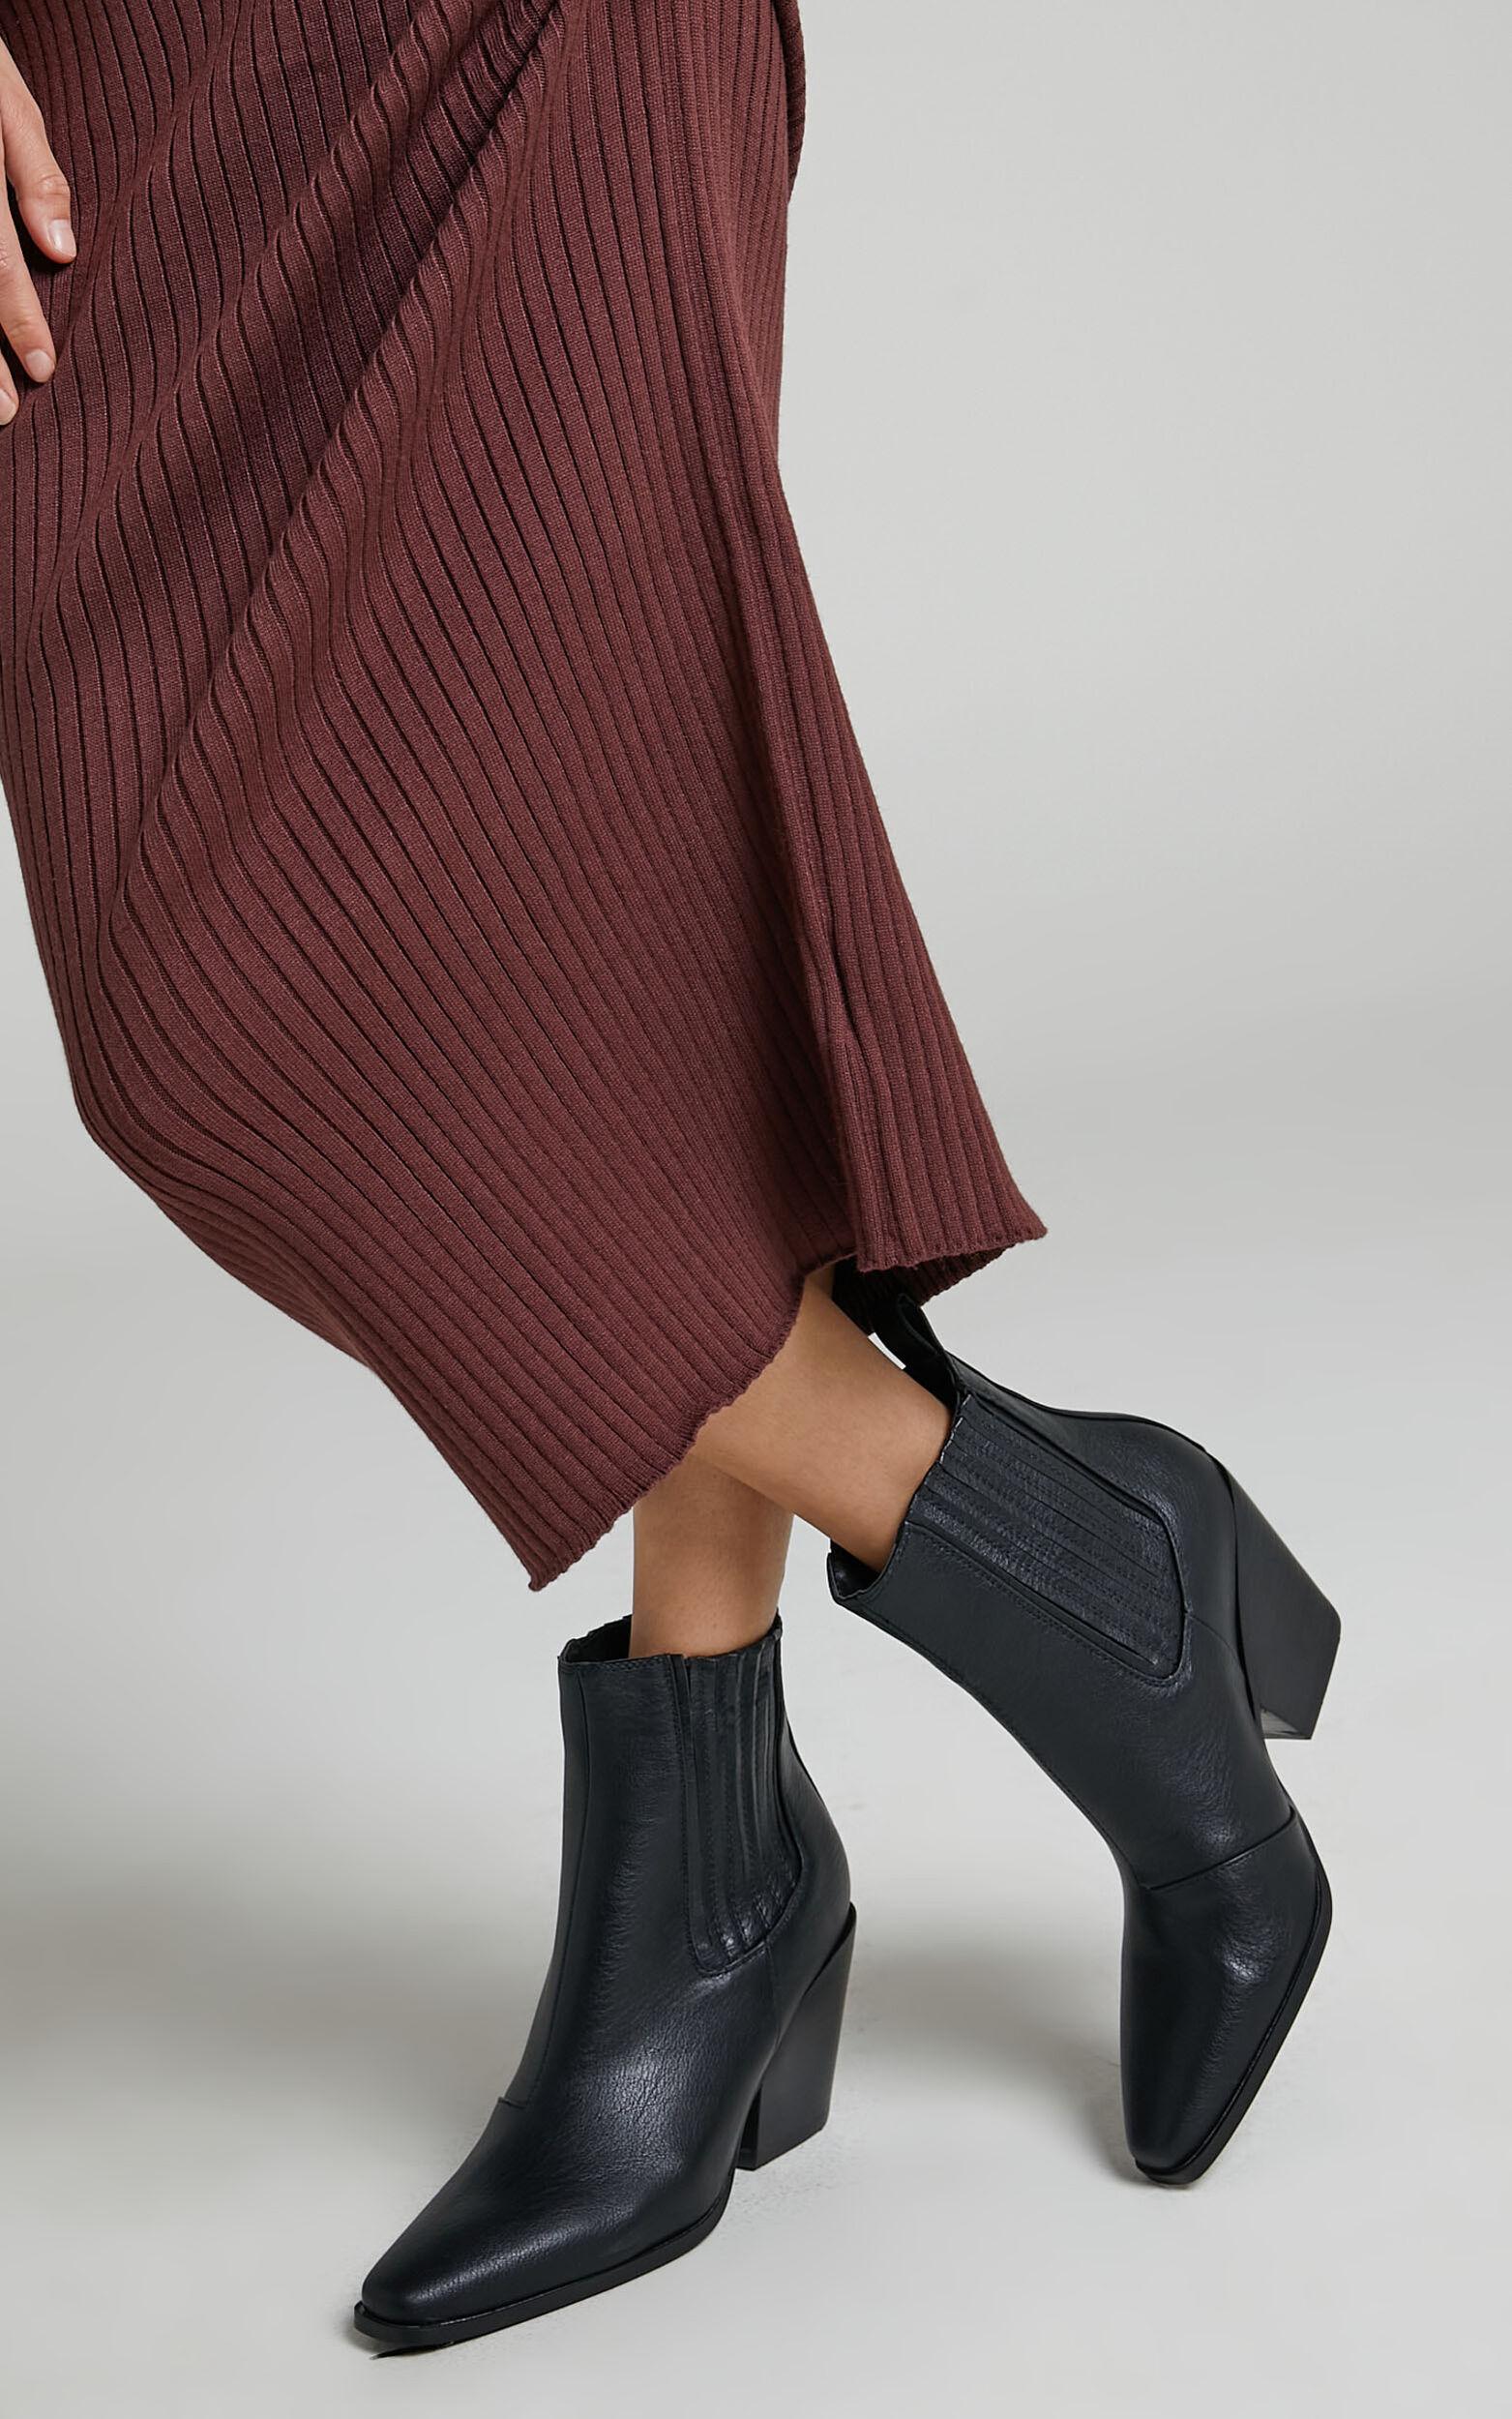 Billini - Calabasas Boots in Black - 05, BLK1, super-hi-res image number null